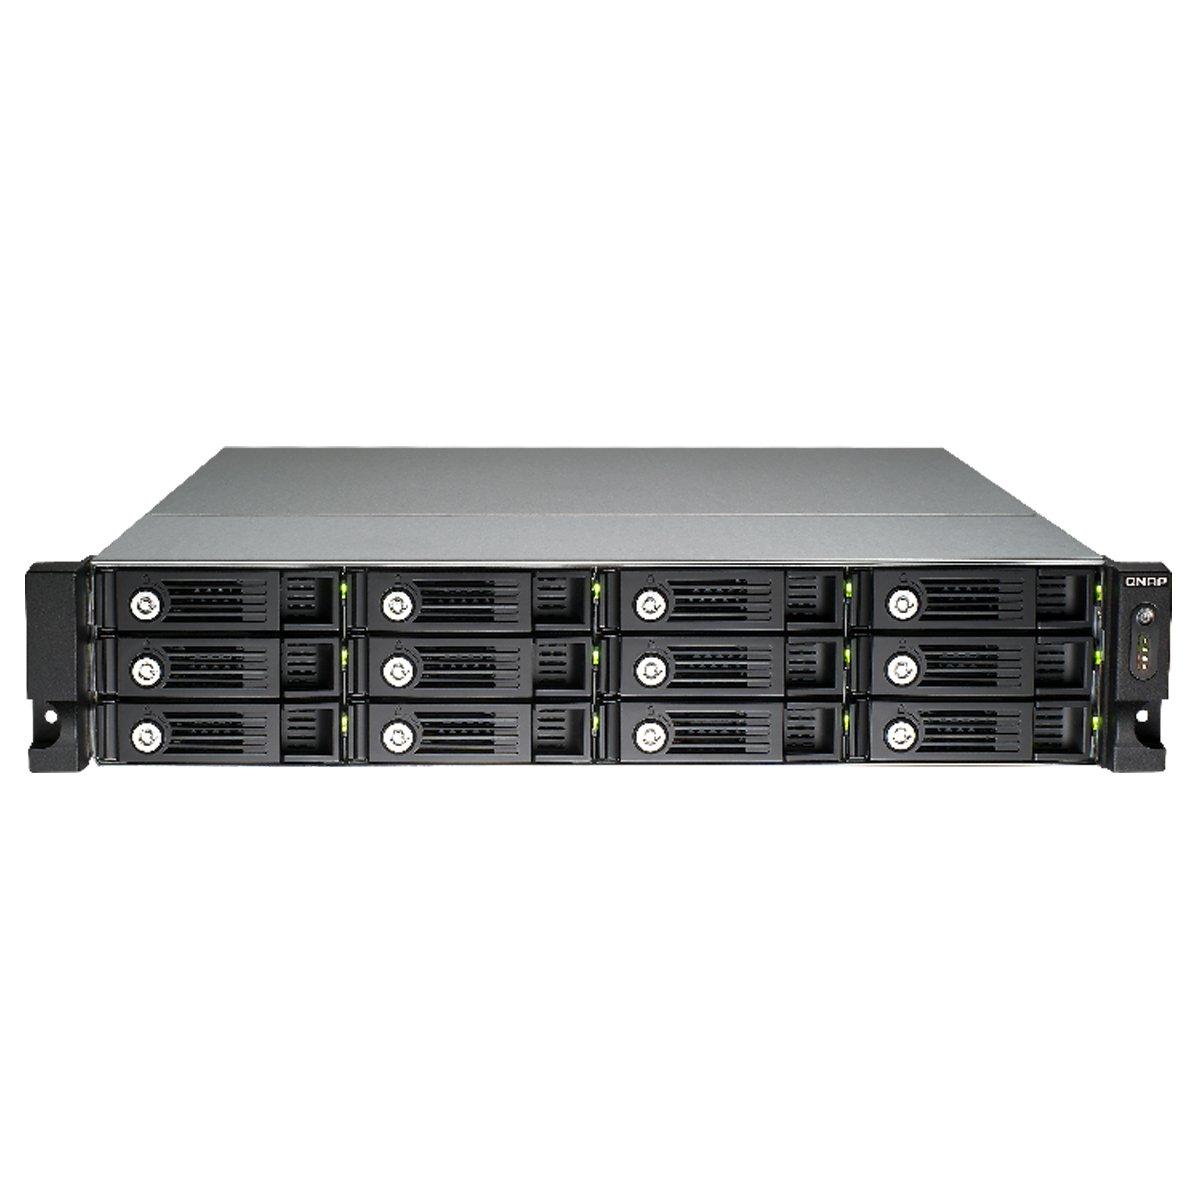 Qnap 12-bay High Performance Unified Storage (TVS-1271U-RP-i7-32G-US)